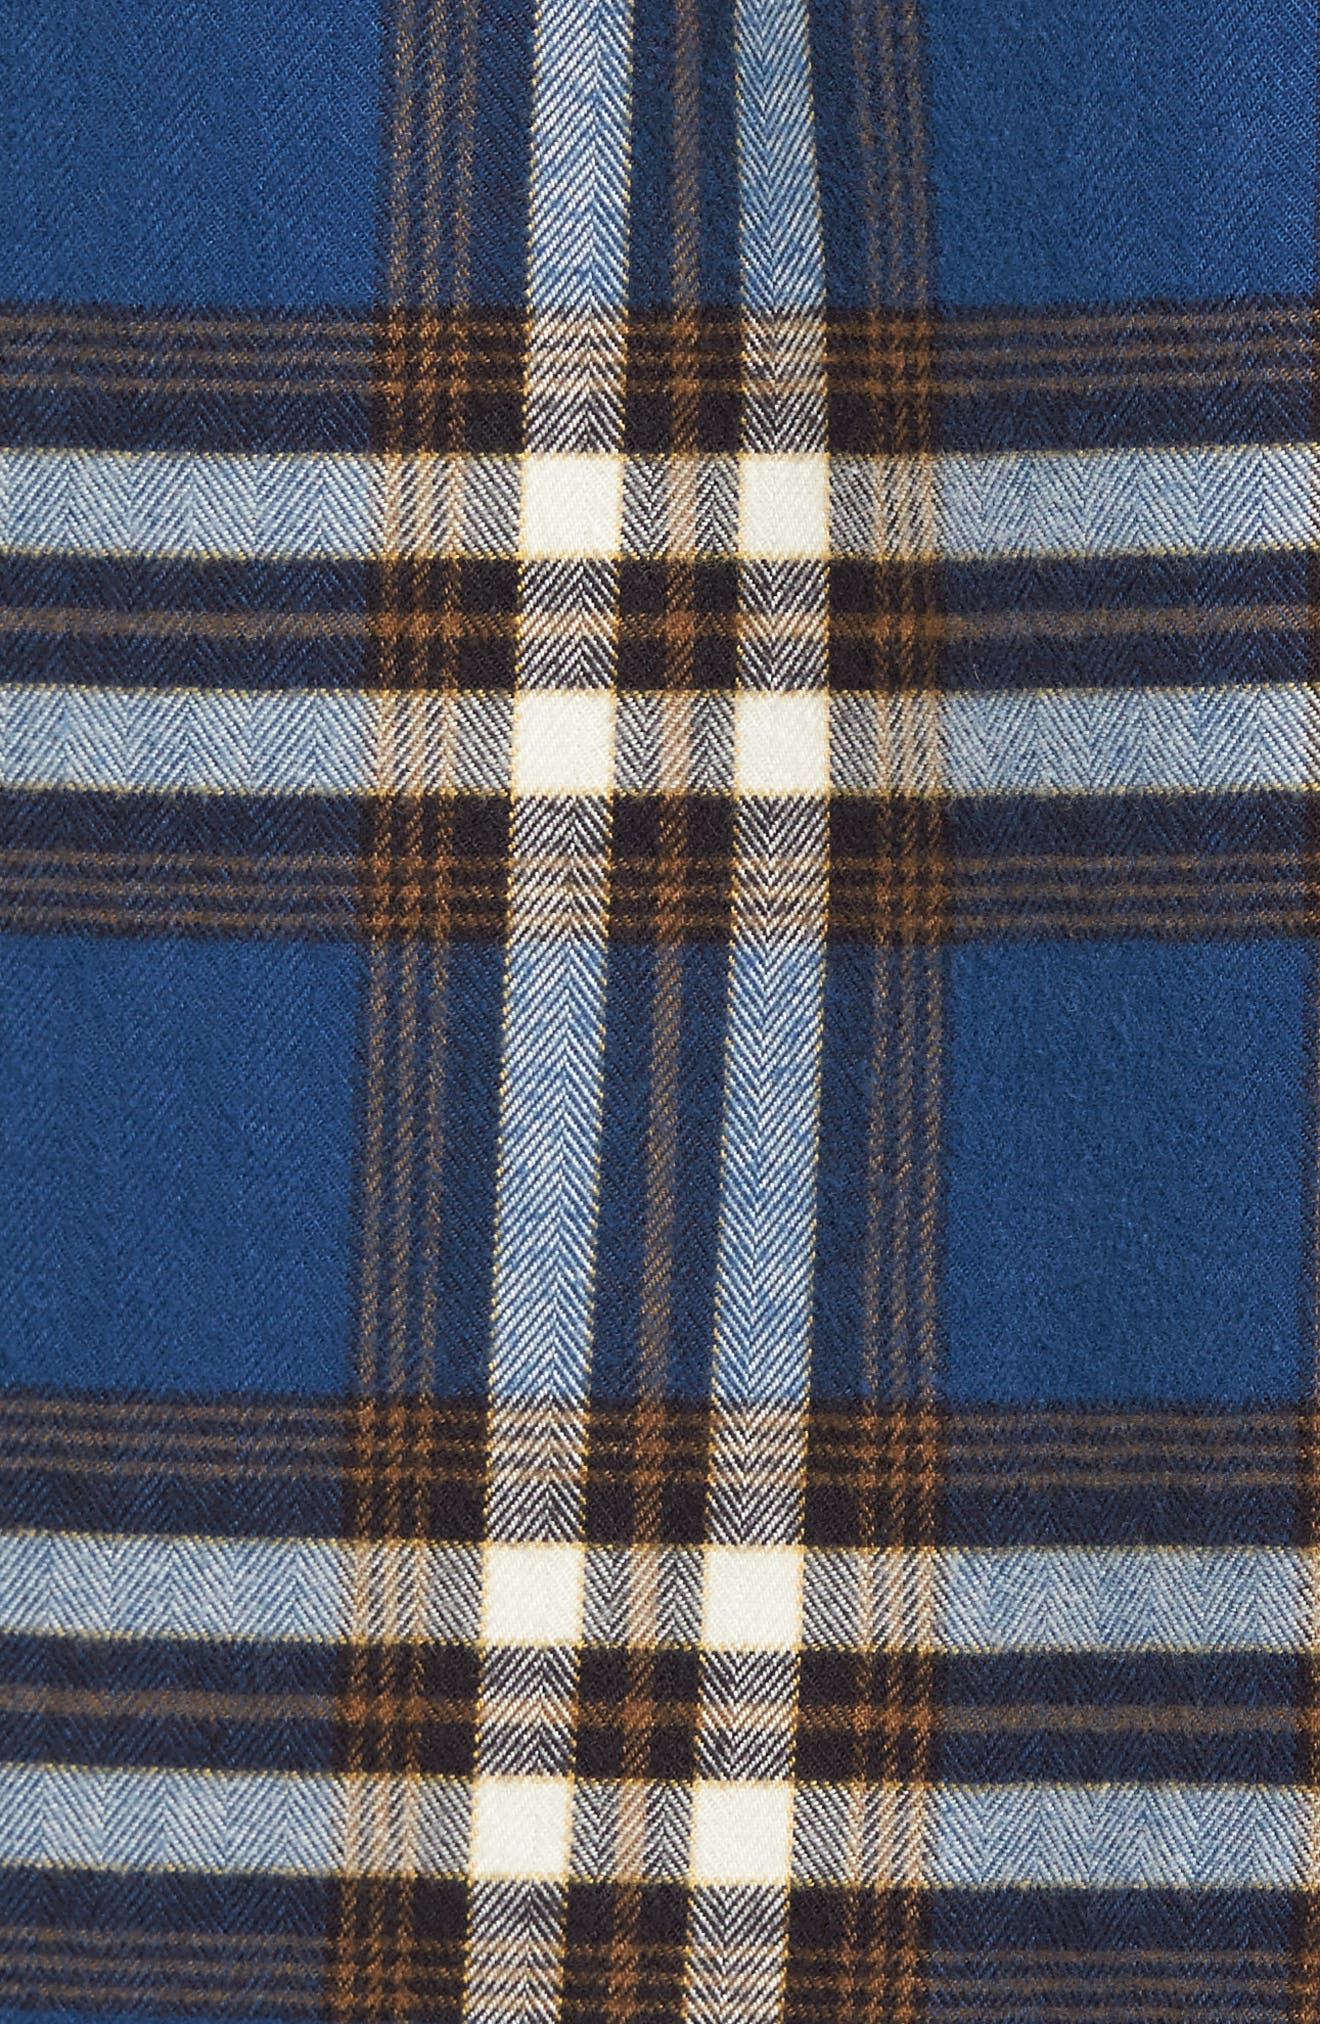 Trim Fit Workwear Check Flannel Shirt,                             Alternate thumbnail 5, color,                             Blue Vintage Brown Plaid